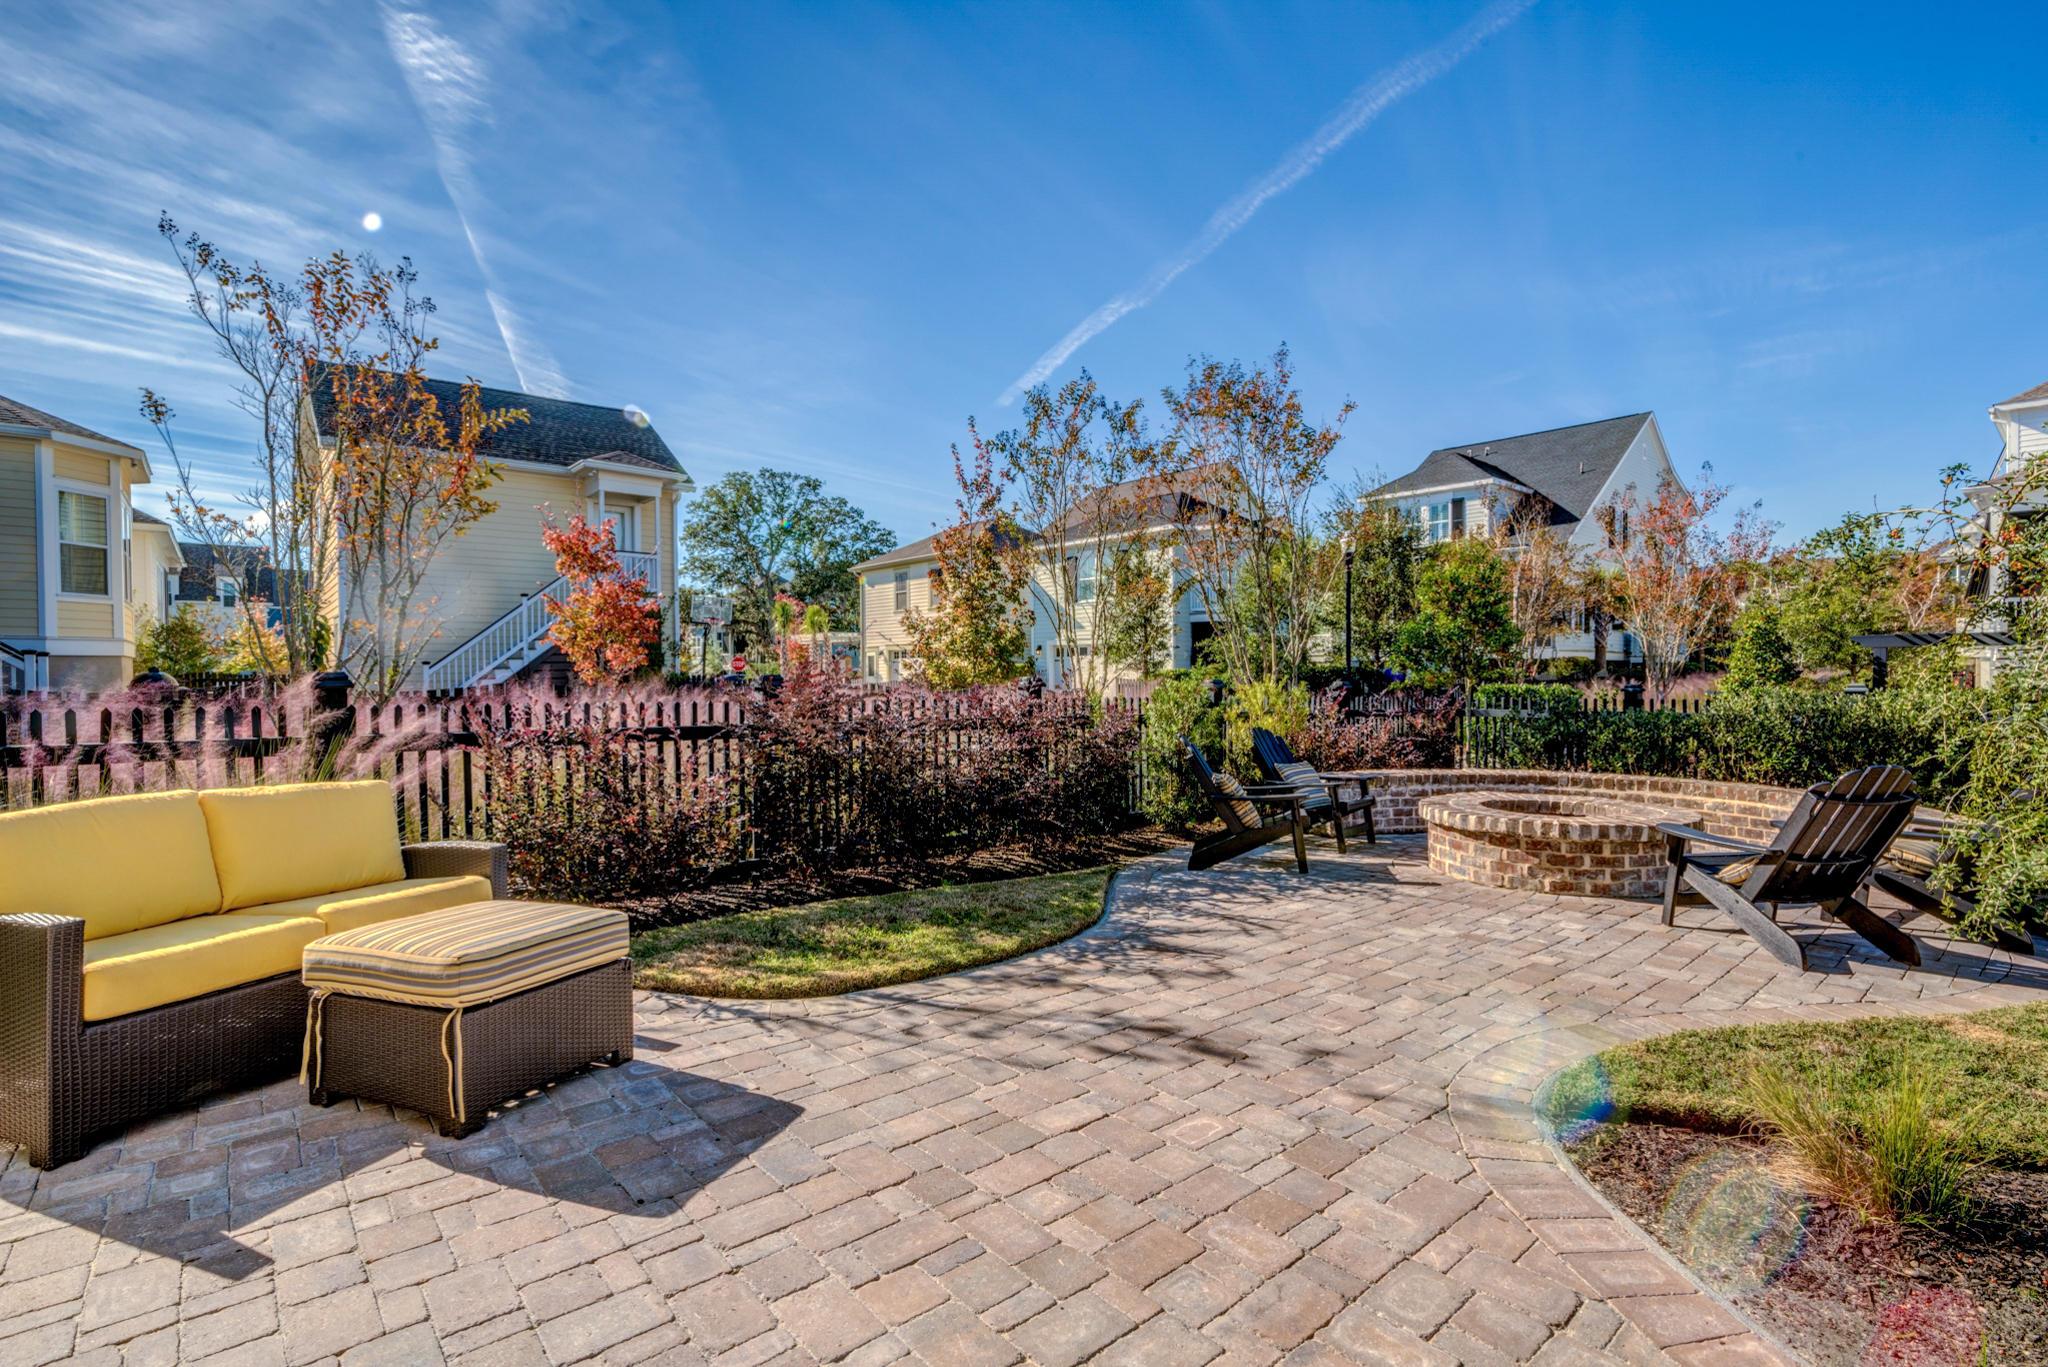 Daniel Island Smythe Park Homes For Sale - 1662 Pierce, Charleston, SC - 29